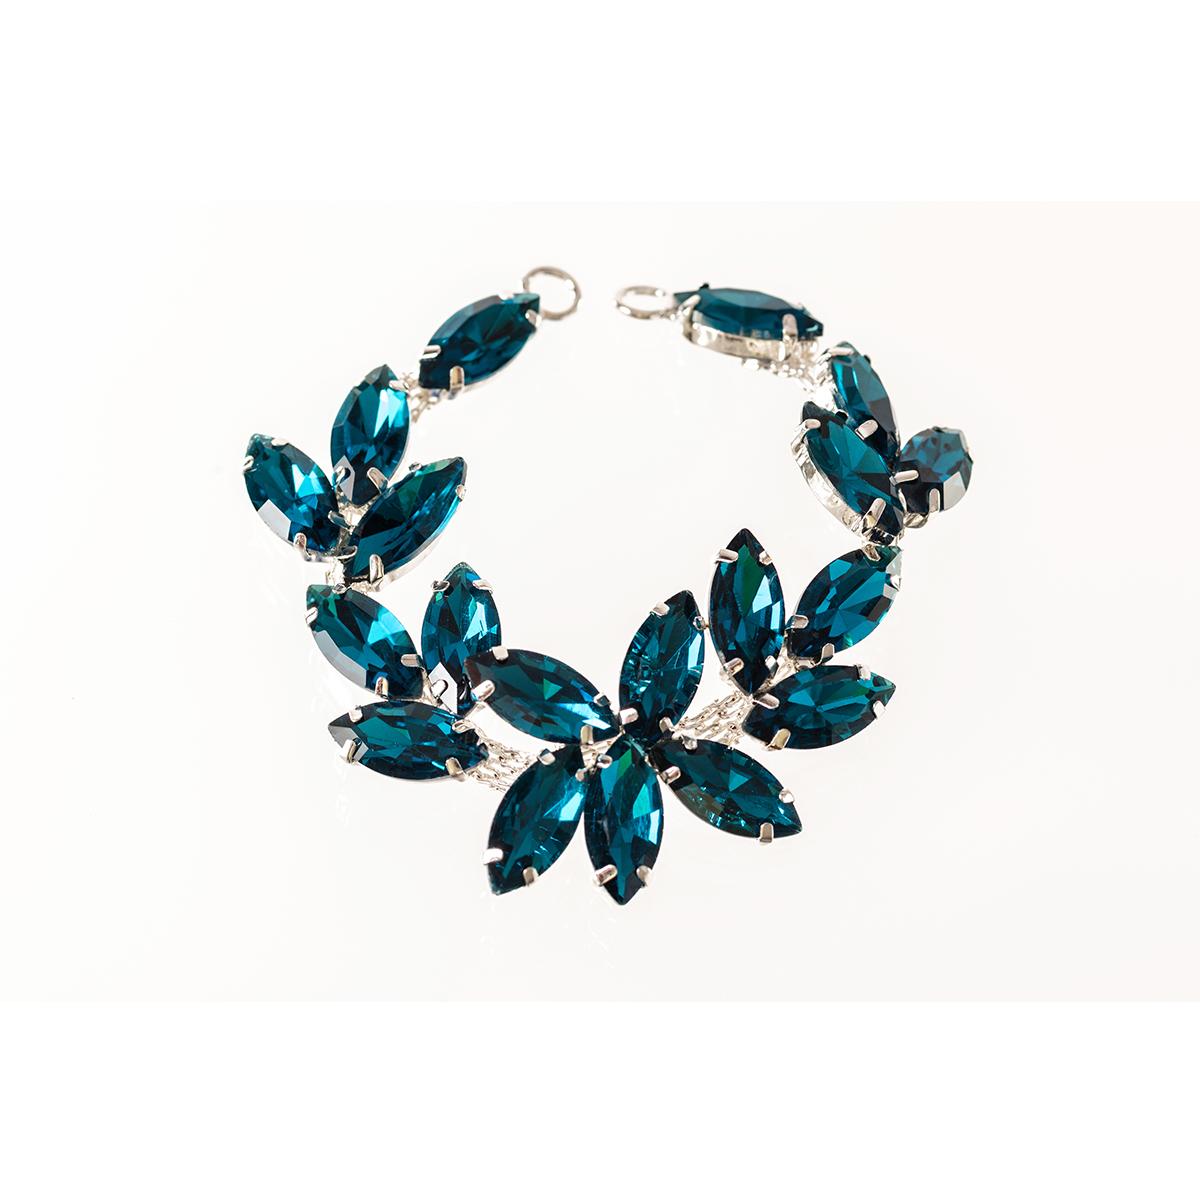 Rhinestone-Diamante-Motif-Applique-Sew-on-Crystal-Patch-for-Wedding-Bridal-Dress thumbnail 35